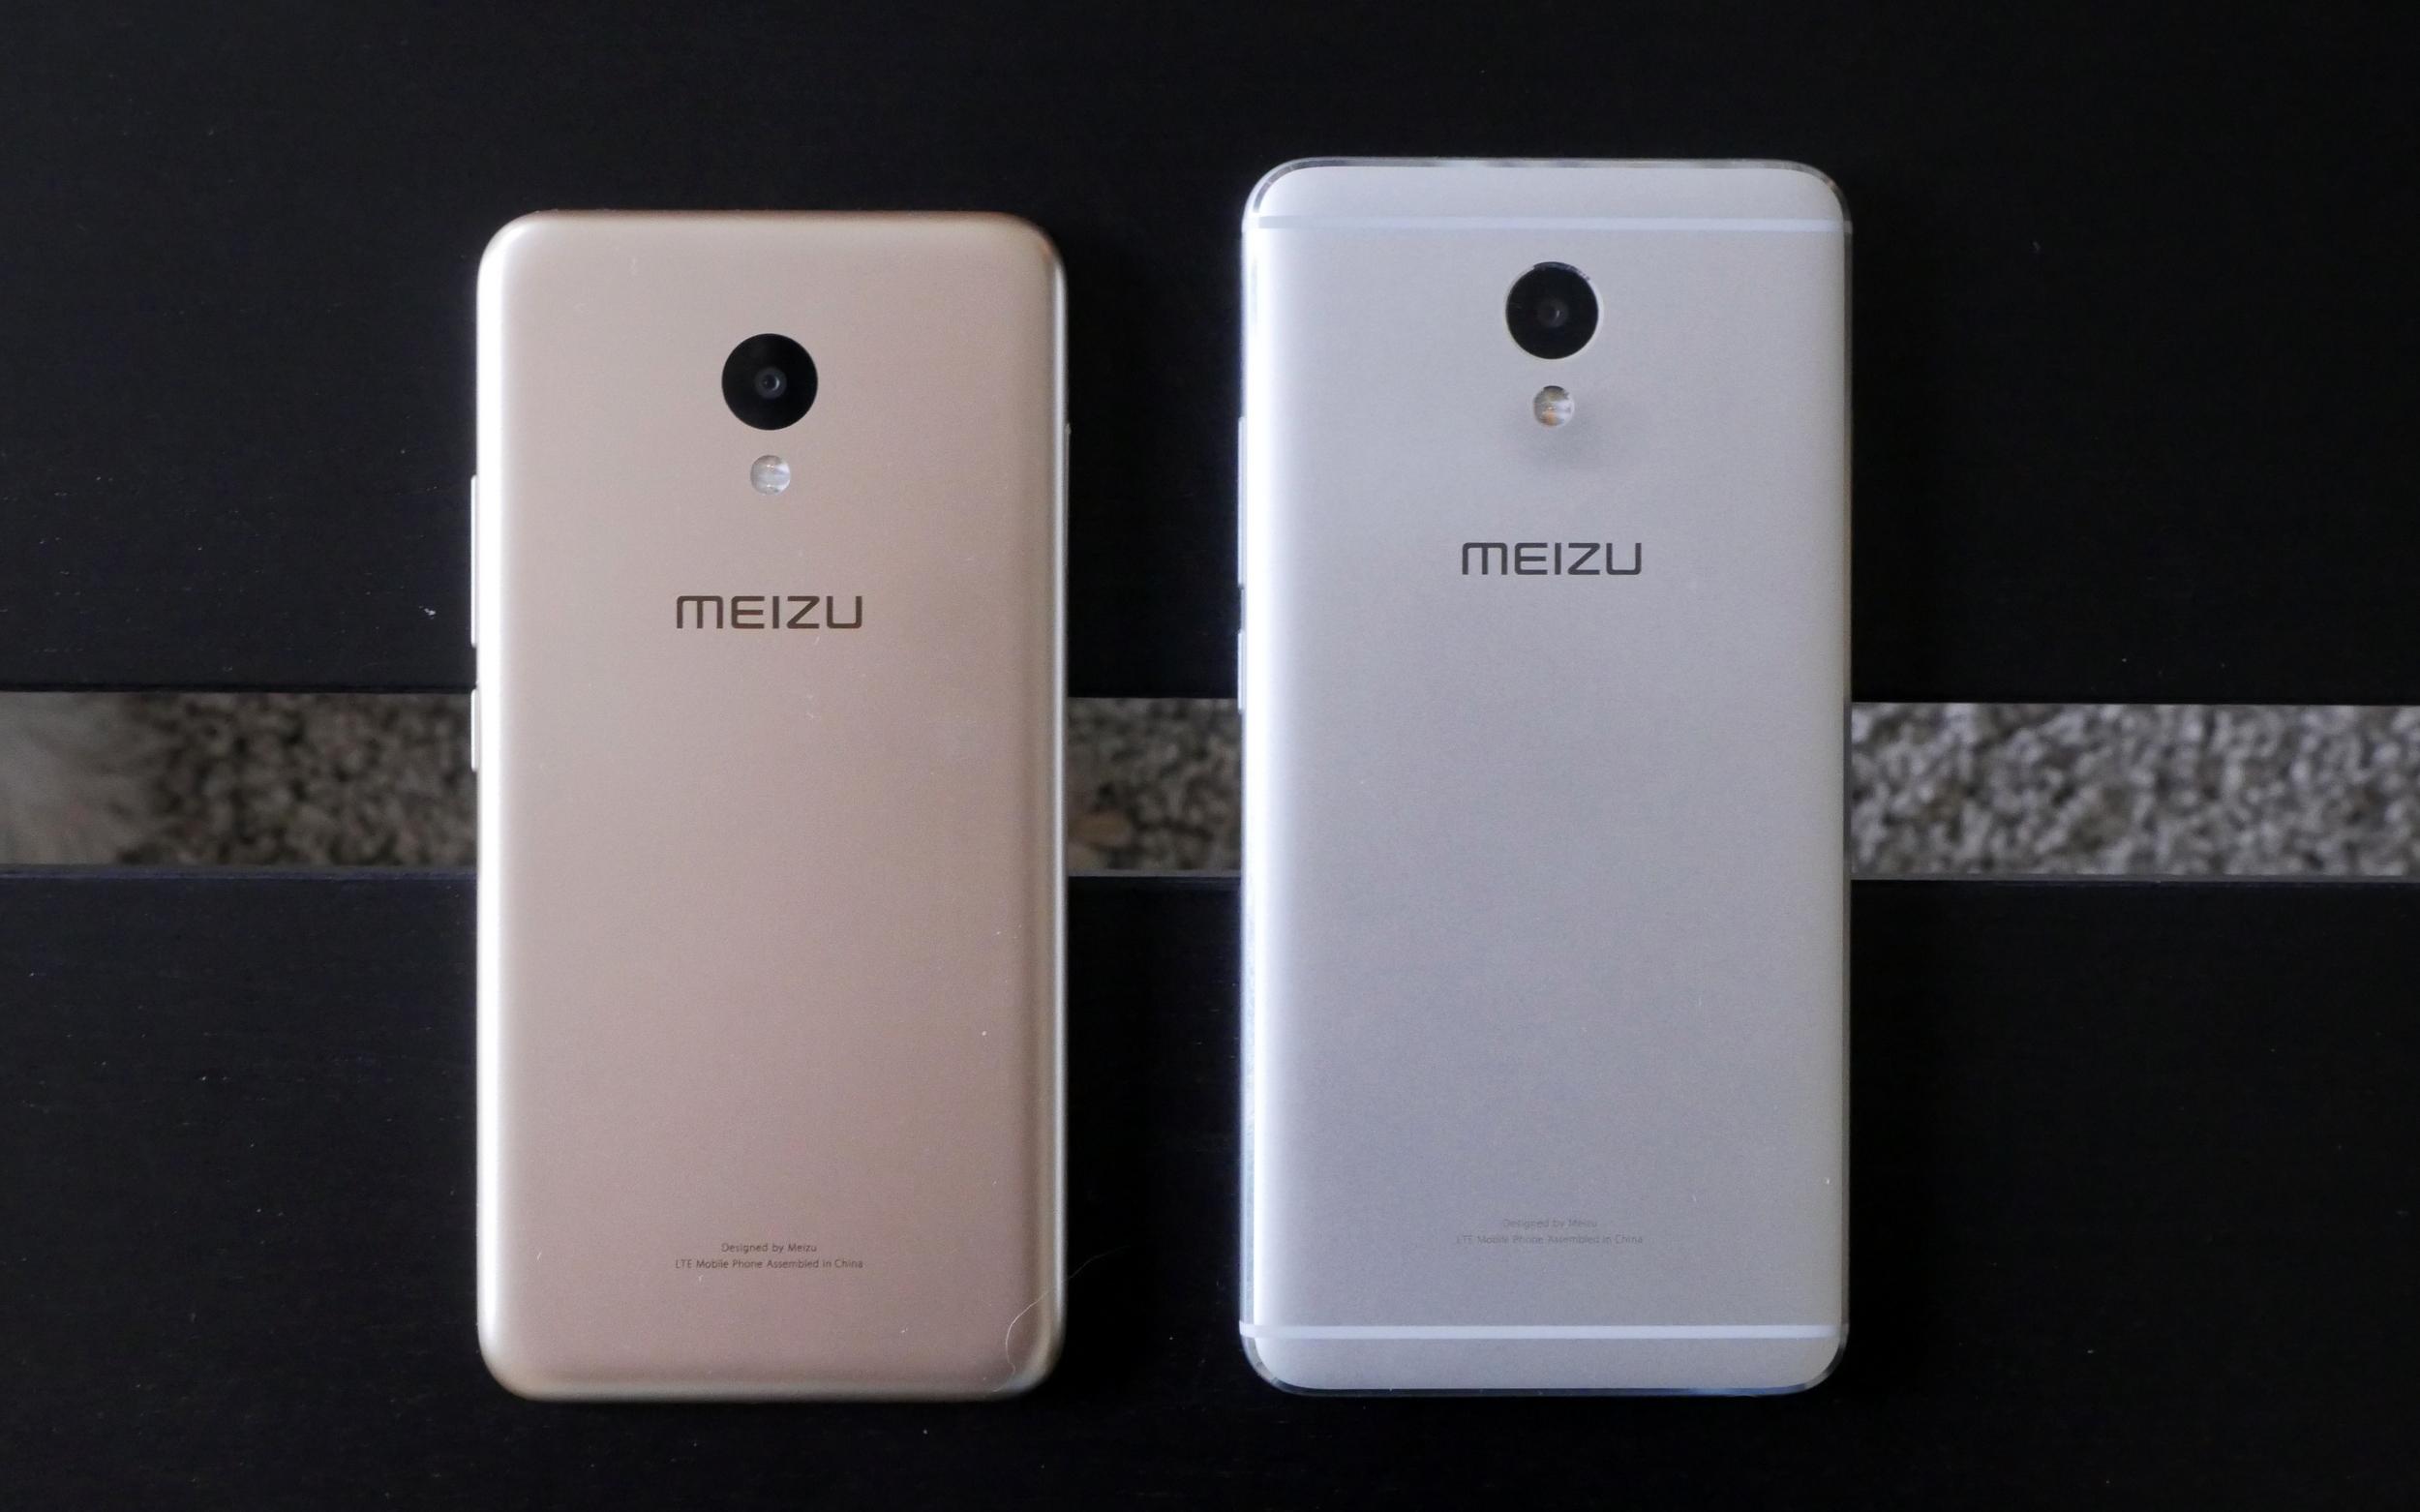 meizu m5 versus m5 note budget smartphone review. Black Bedroom Furniture Sets. Home Design Ideas